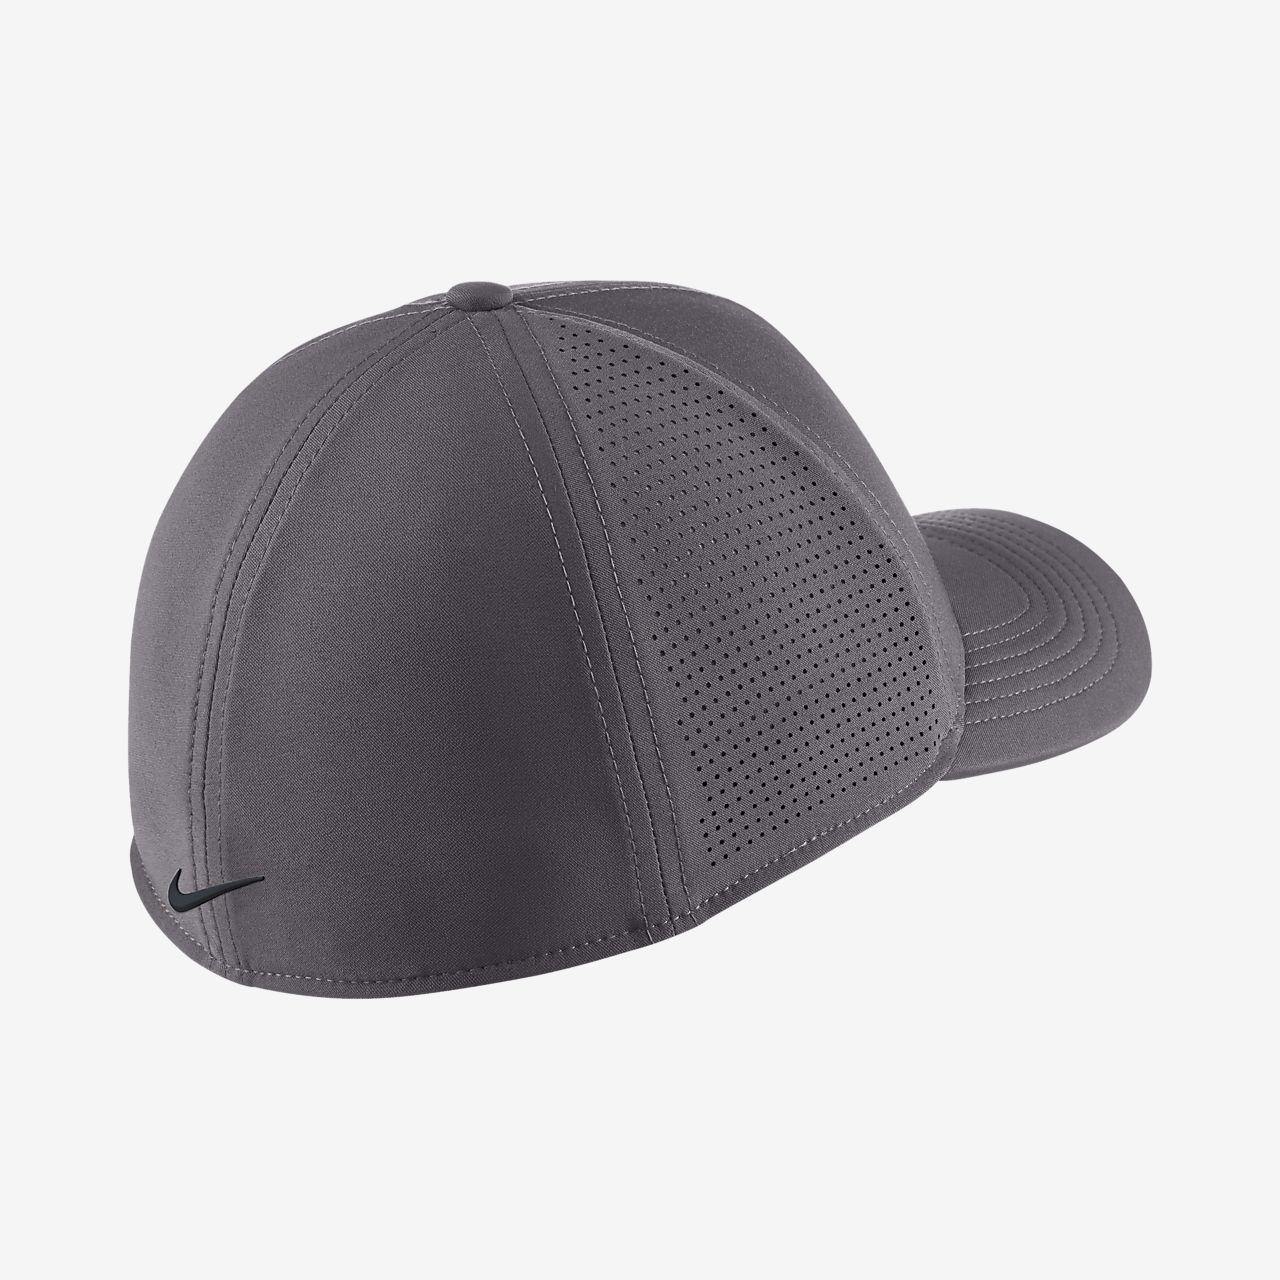 a0534c5e353 Nike AeroBill Classic 99 Fitted Golf Hat. Nike.com GB